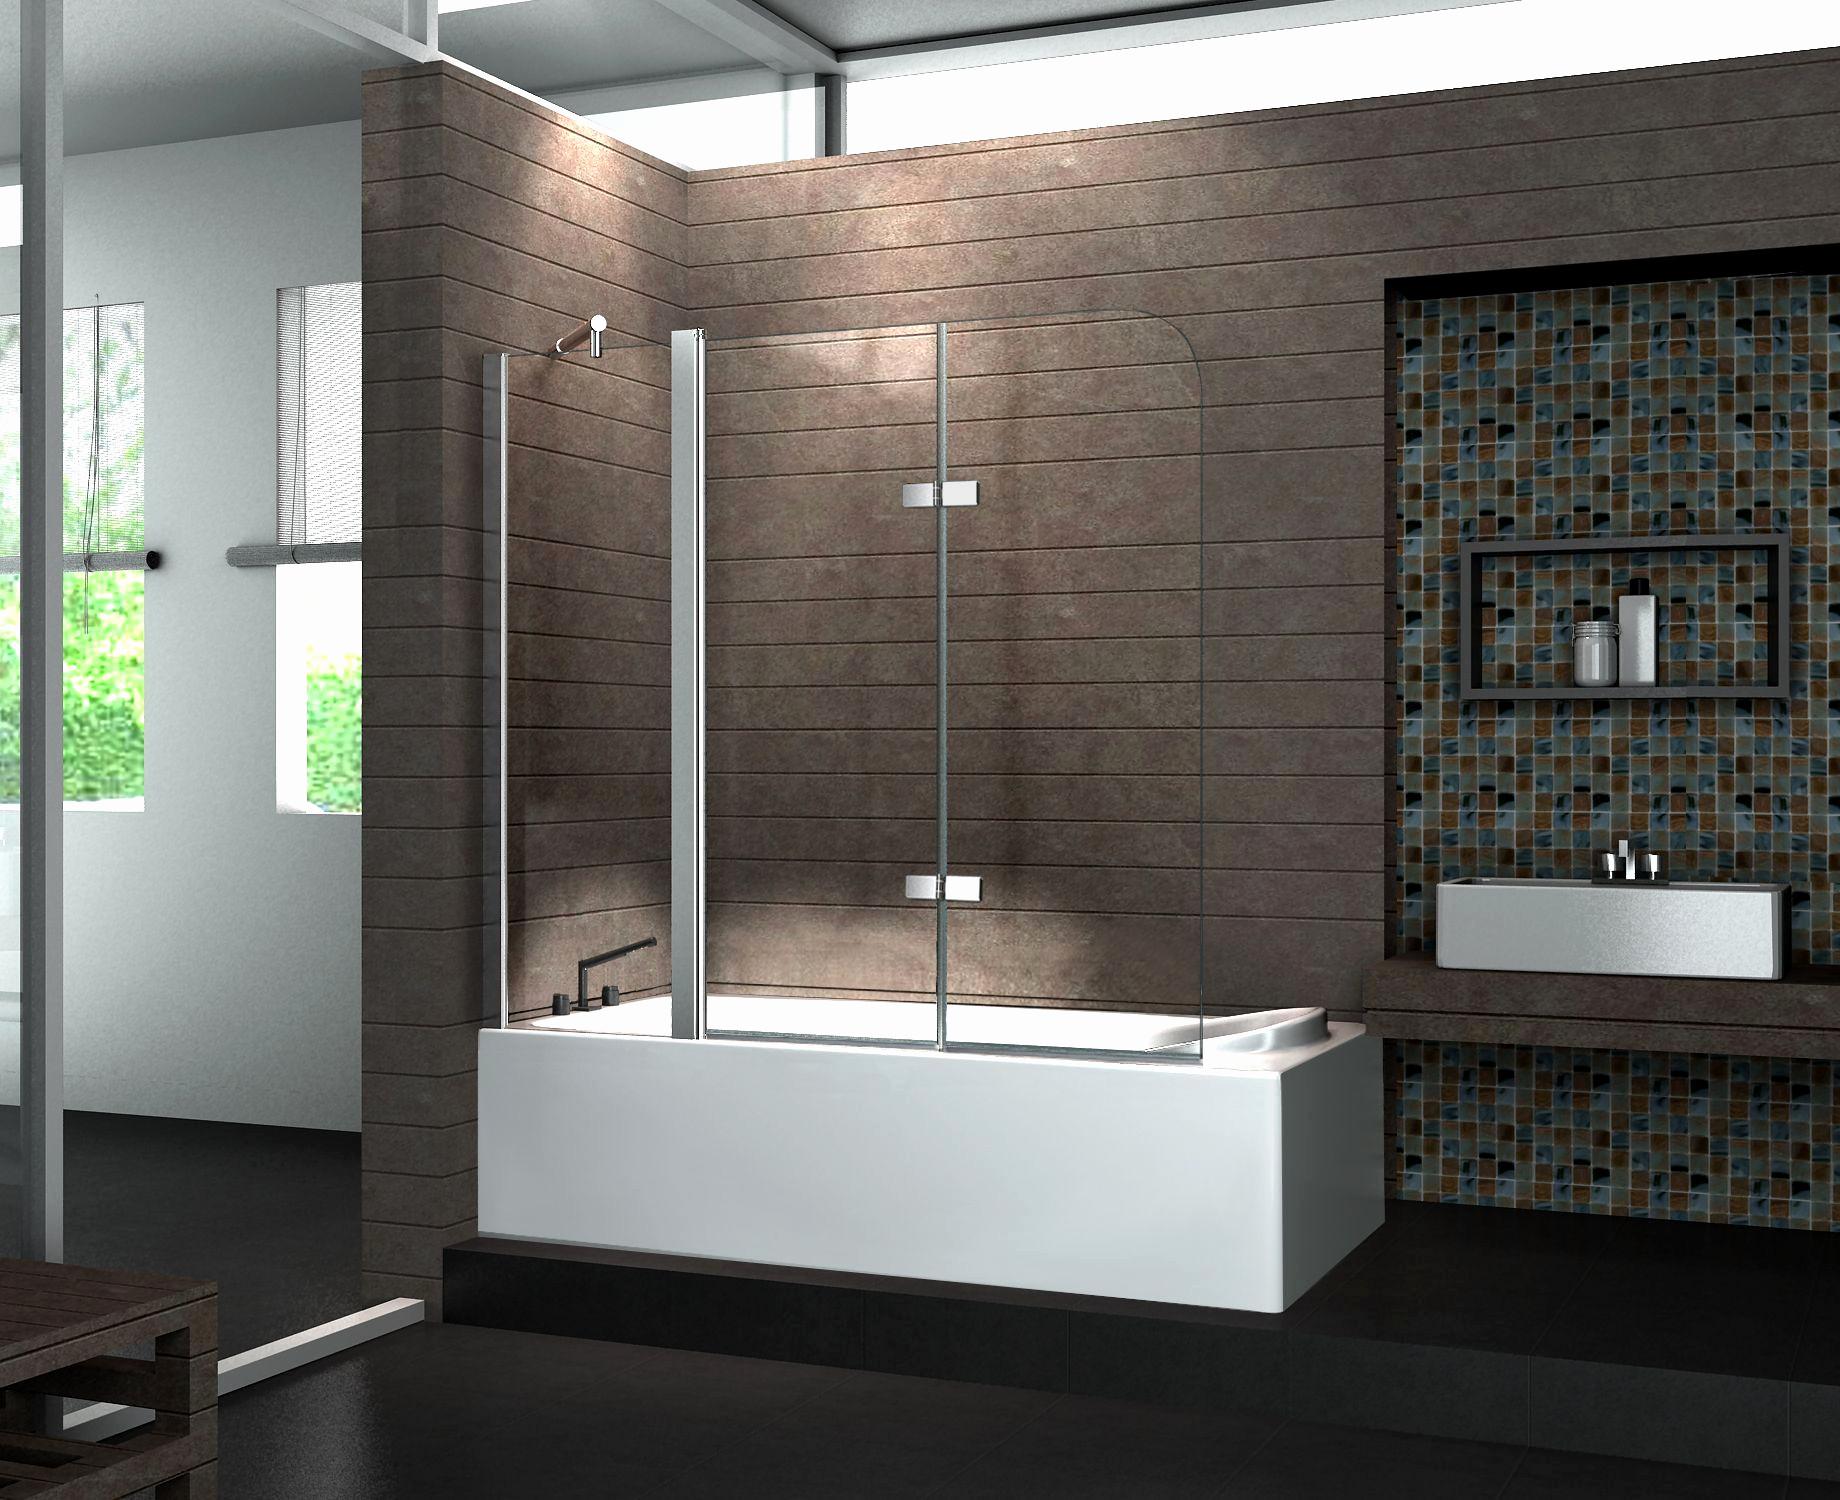 Badewanne Duschwand  Duschwand Badewanne Glas Interieur